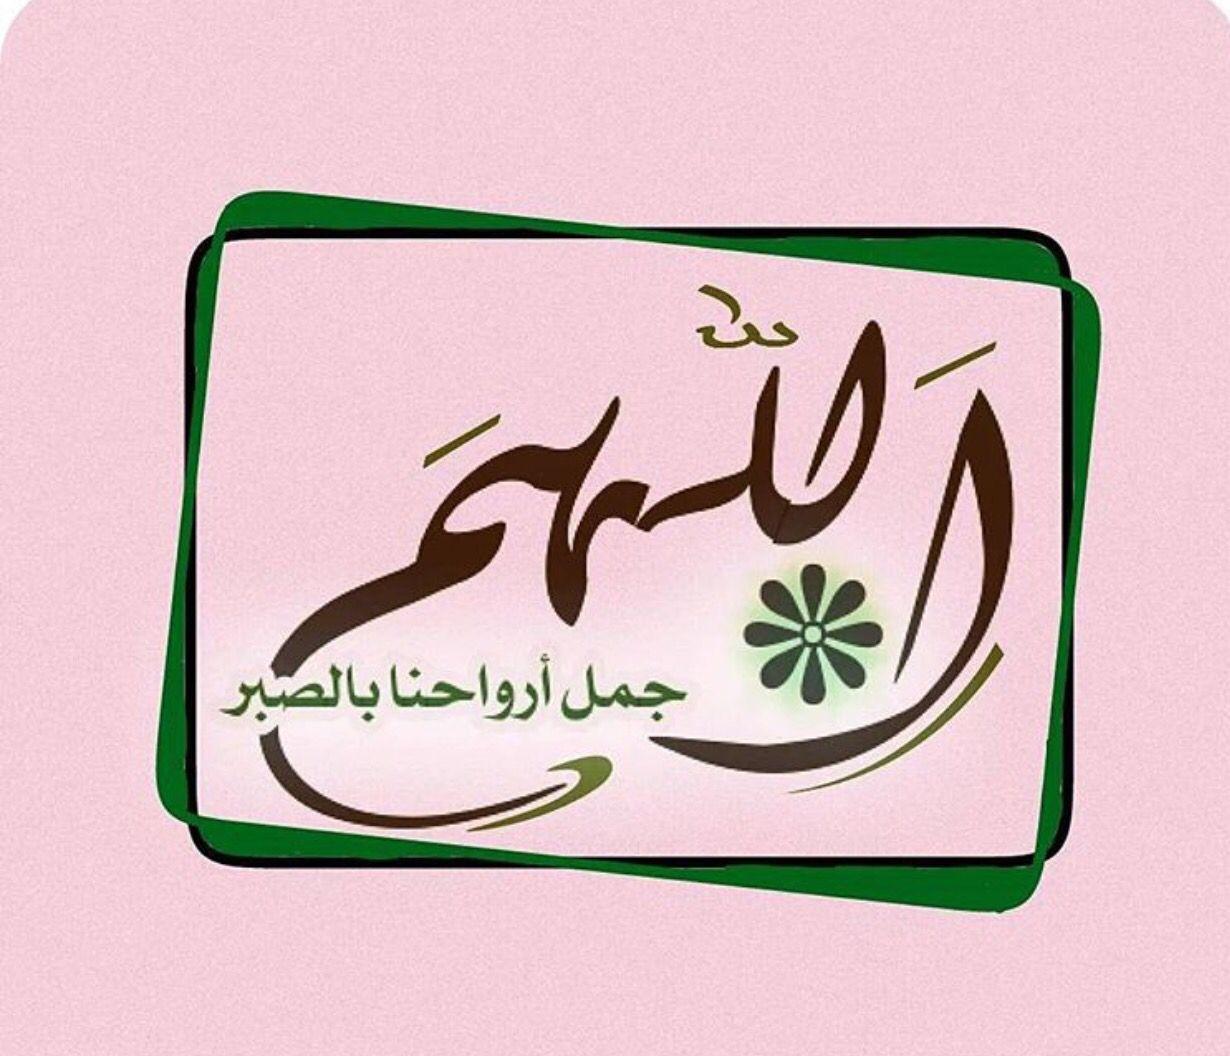 اللهم جملنا بالصبر Enamel Pins Arabic Calligraphy Calligraphy